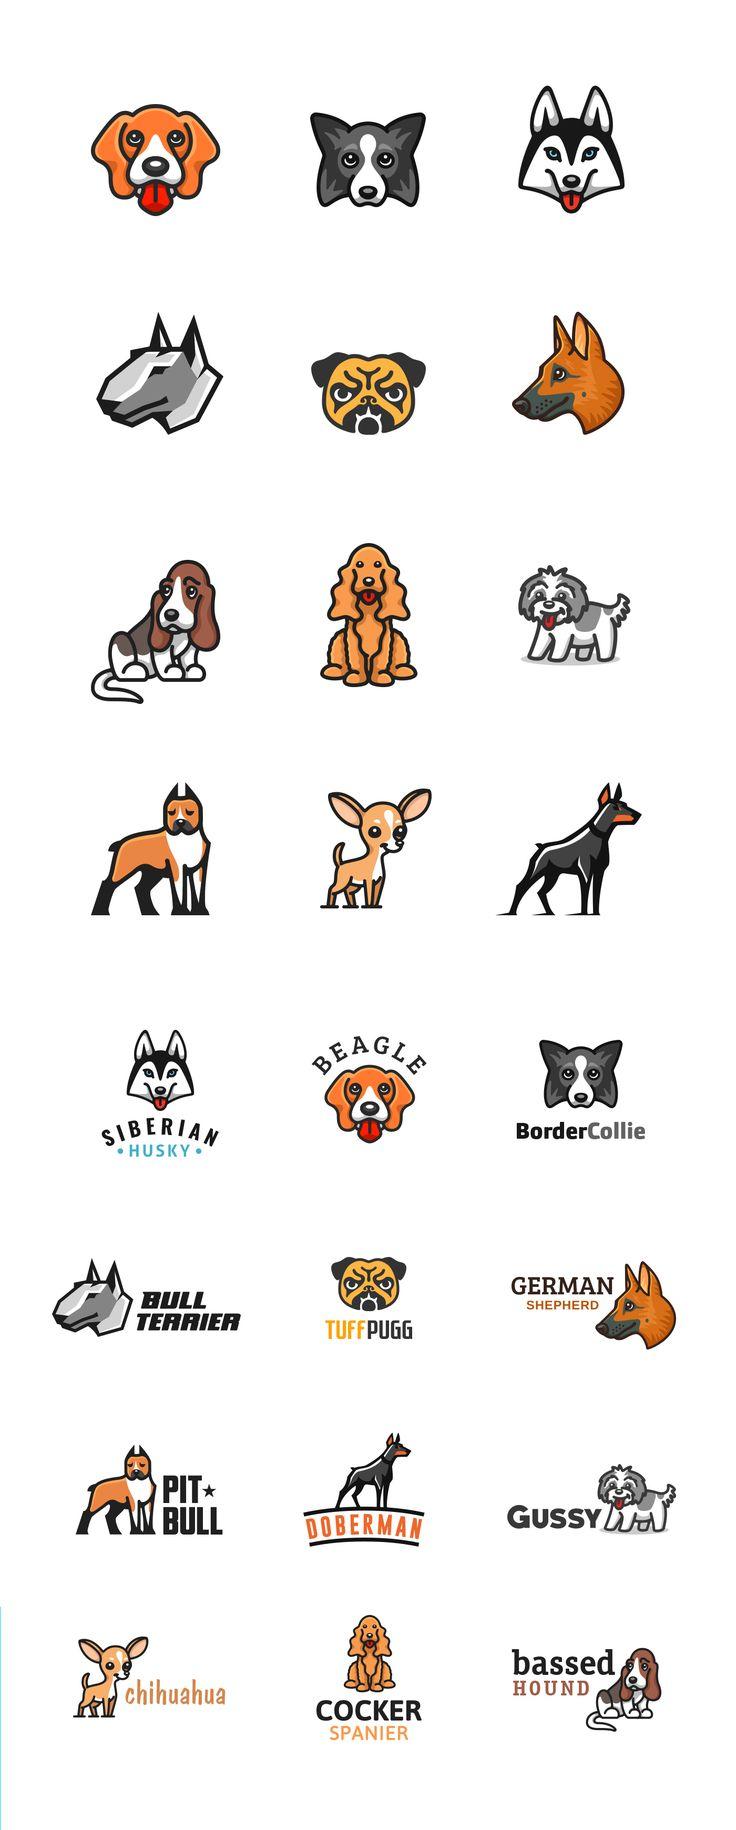 Dog designs http://jrstudioweb.com/diseno-grafico/diseno-de-logotipos/